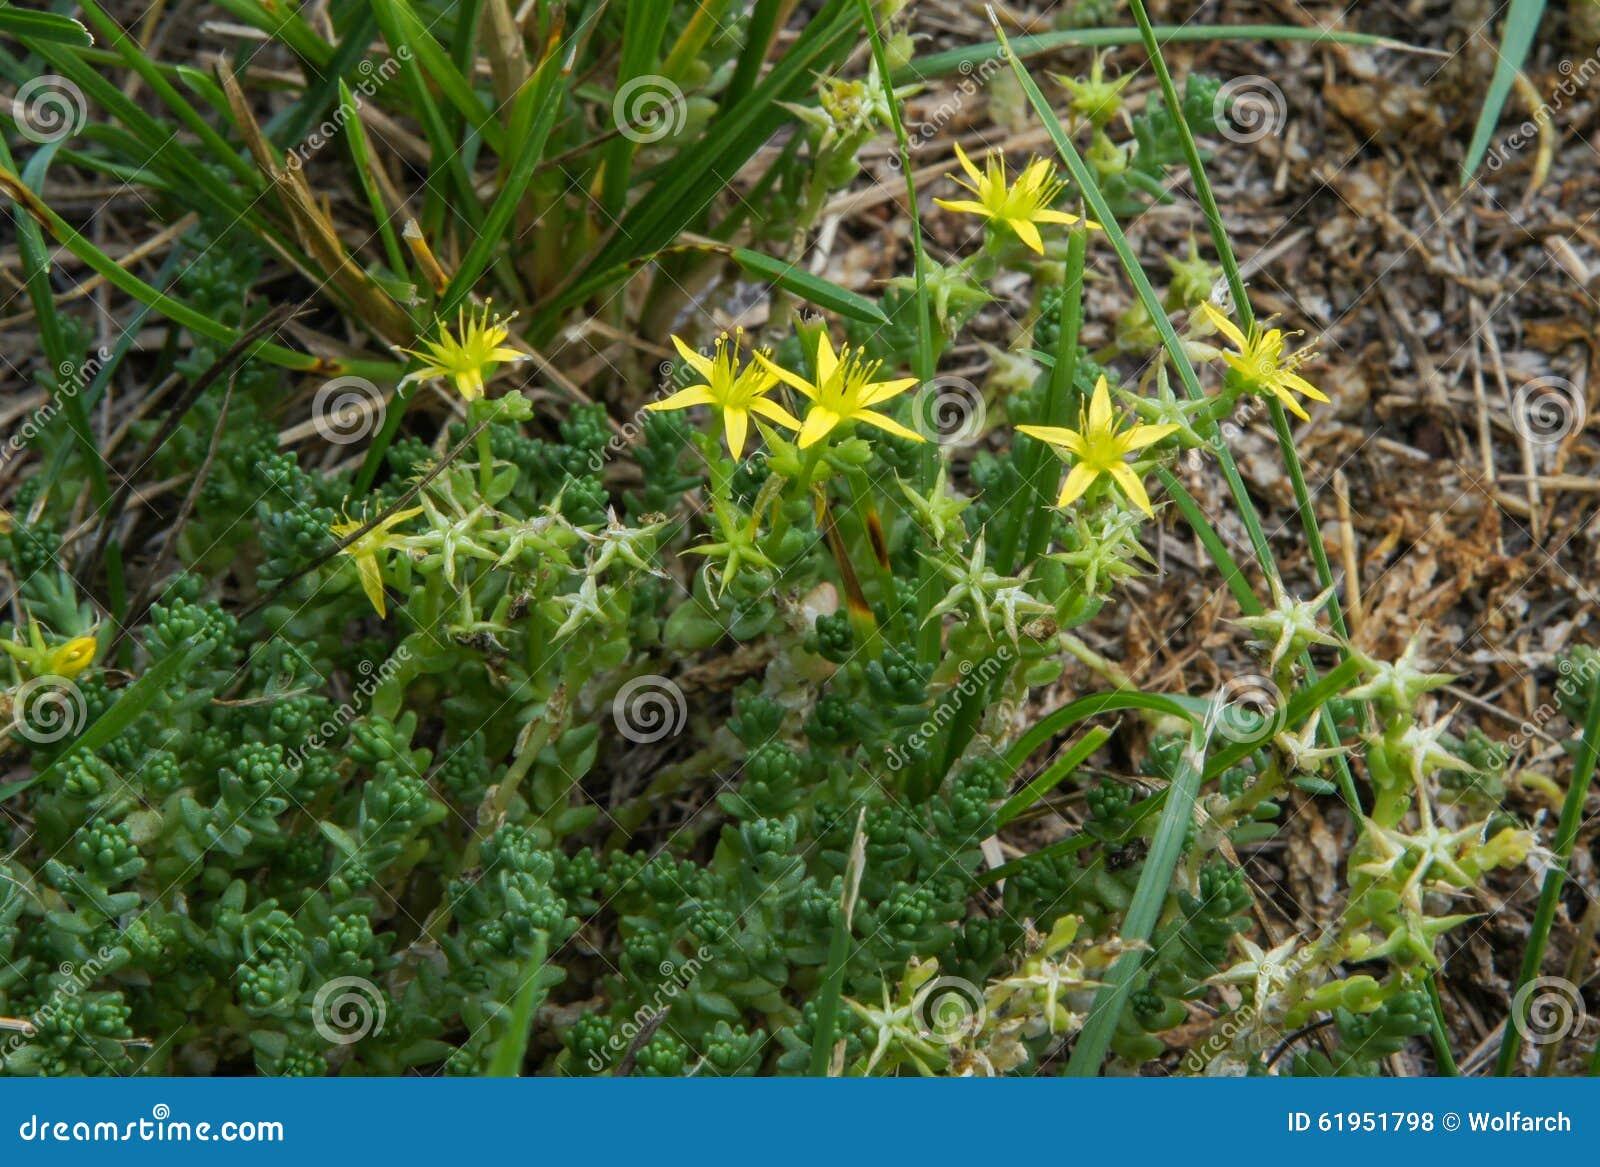 Yellow flowers on succulent plant stock photo image of yellow yellow flowers on succulent plant mightylinksfo